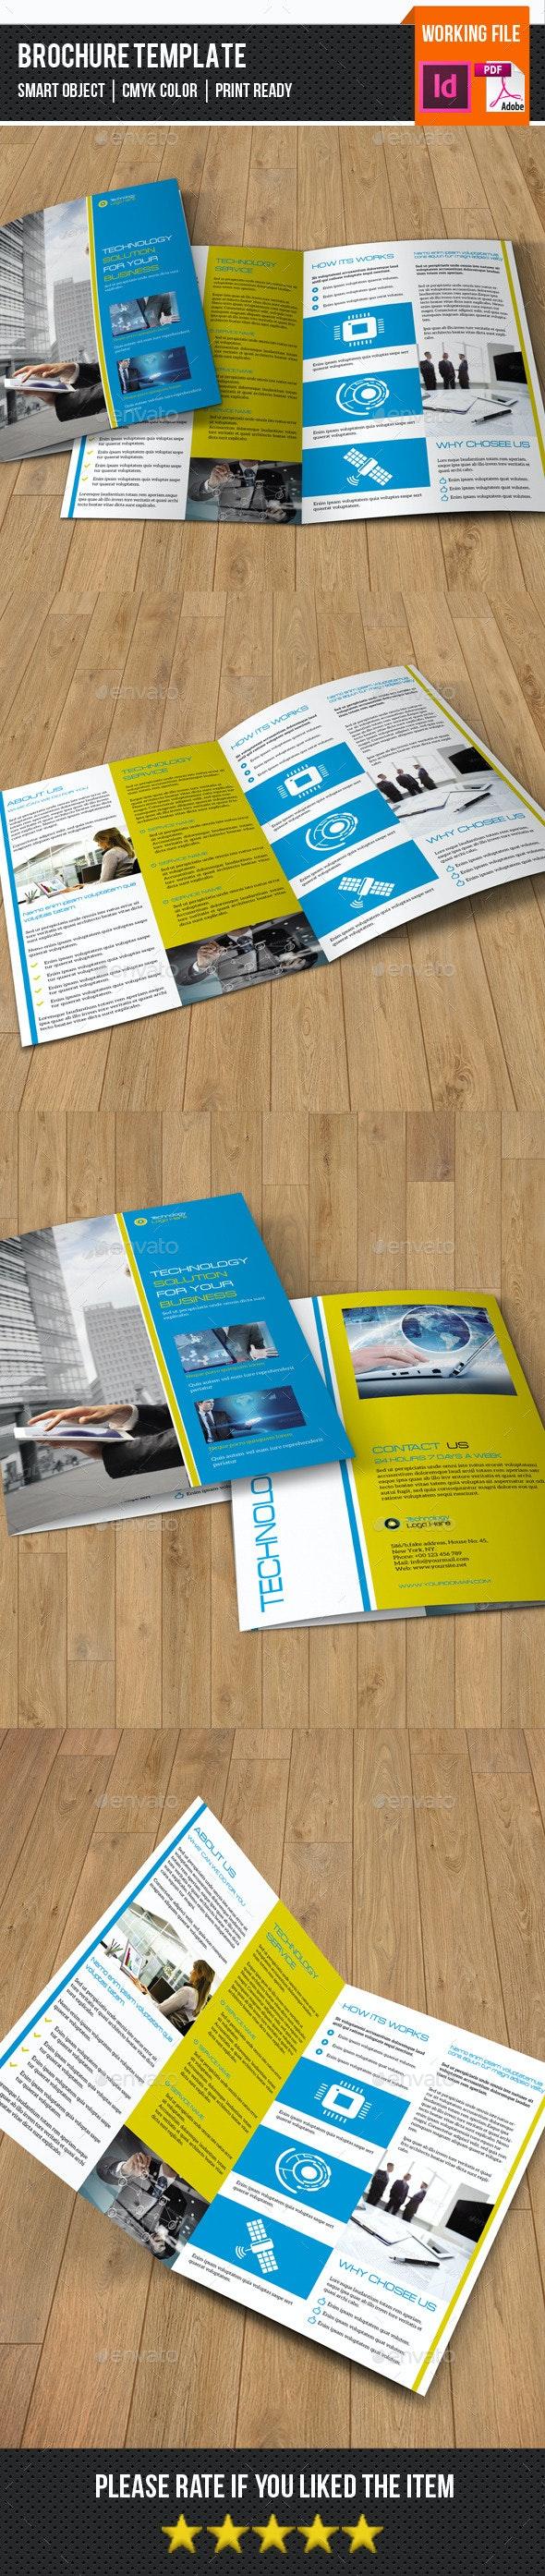 4 Page Technology Brochure-V296 - Corporate Brochures